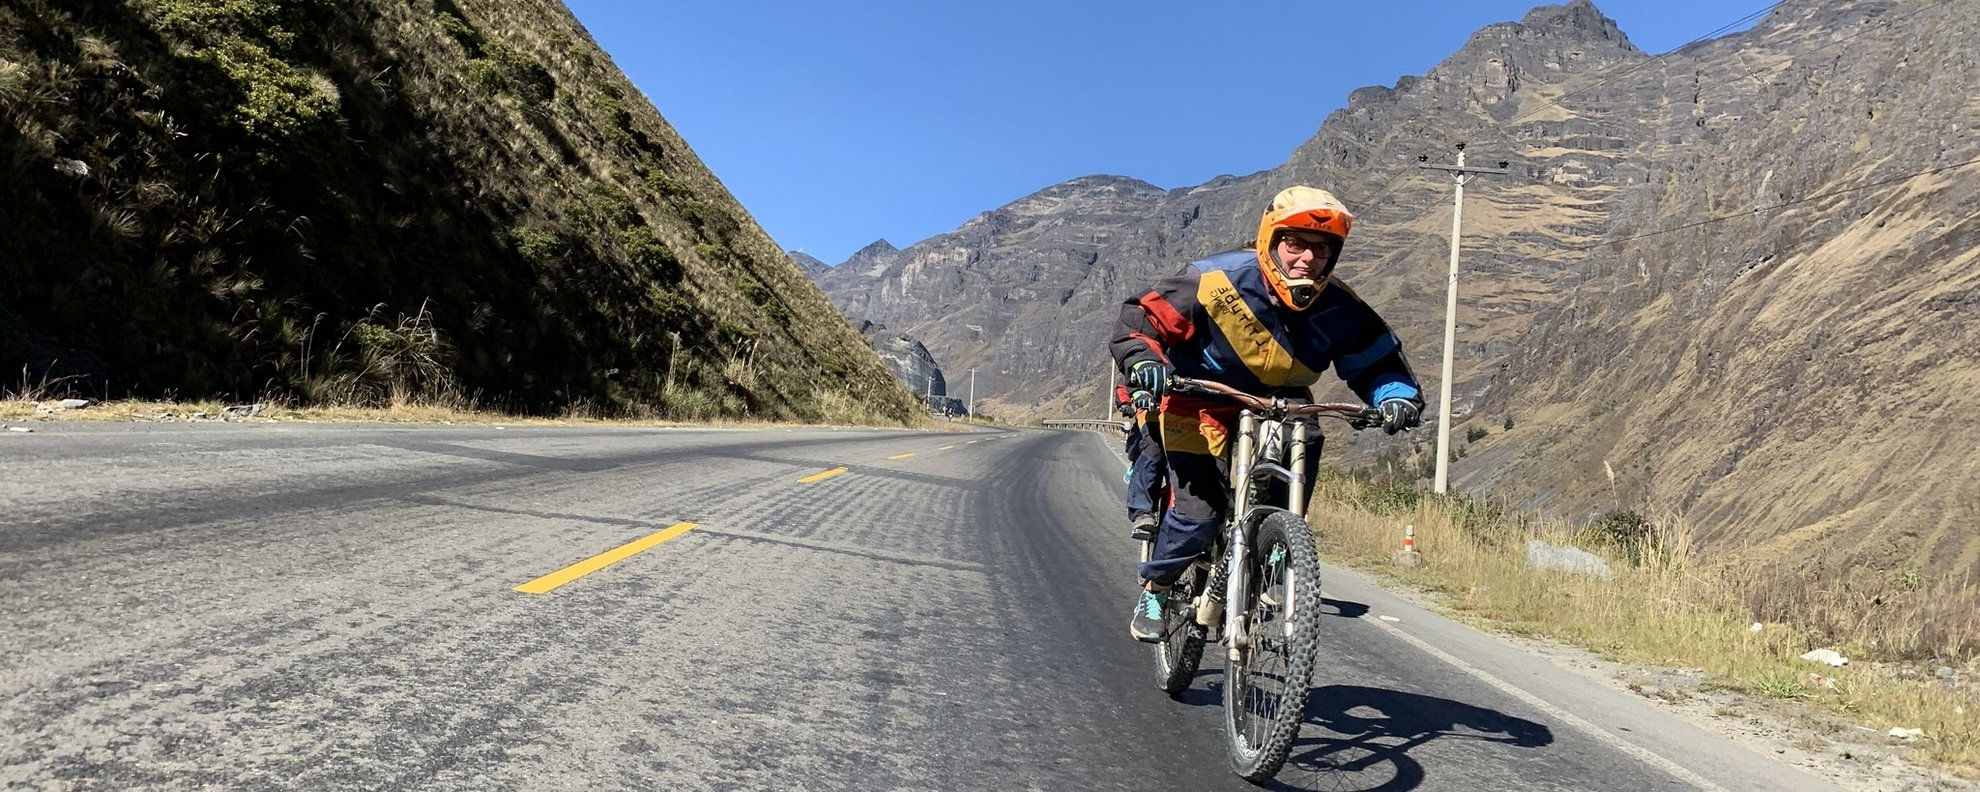 Prachtige rondreis door Peru en Bolivia<span>!</span>